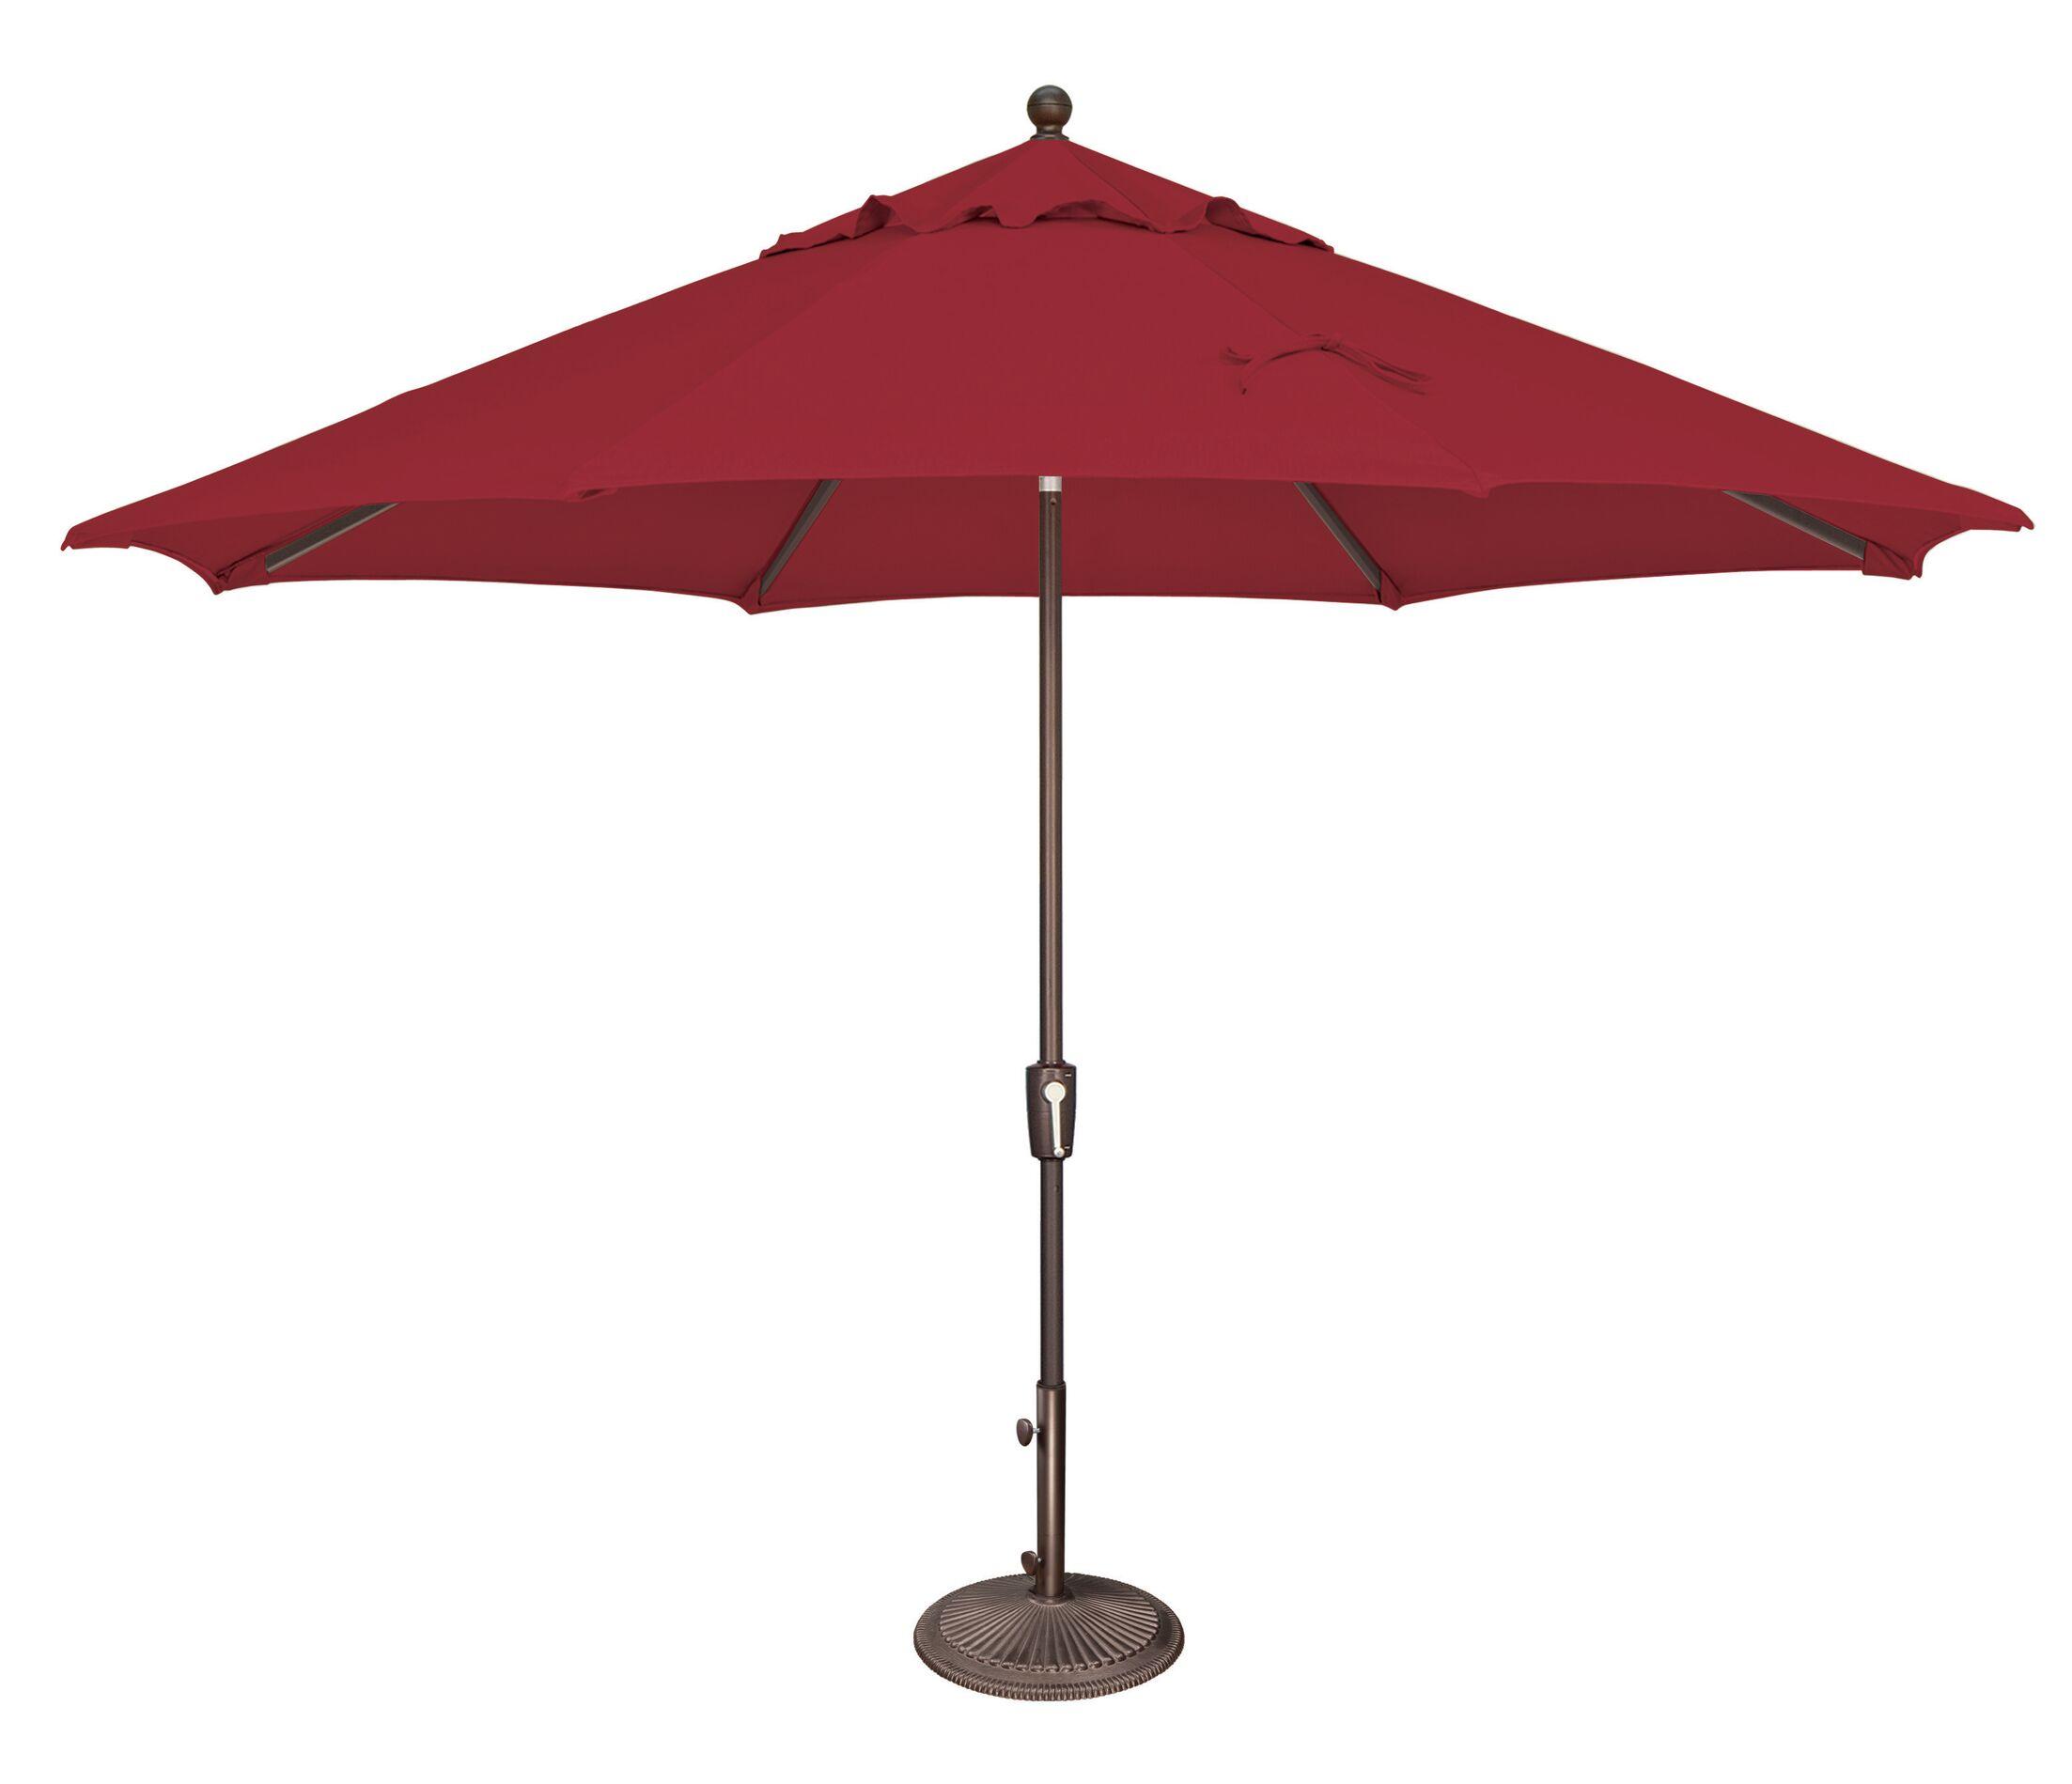 Catalina 11' Market Umbrella Fabric: Solefin / Really Red